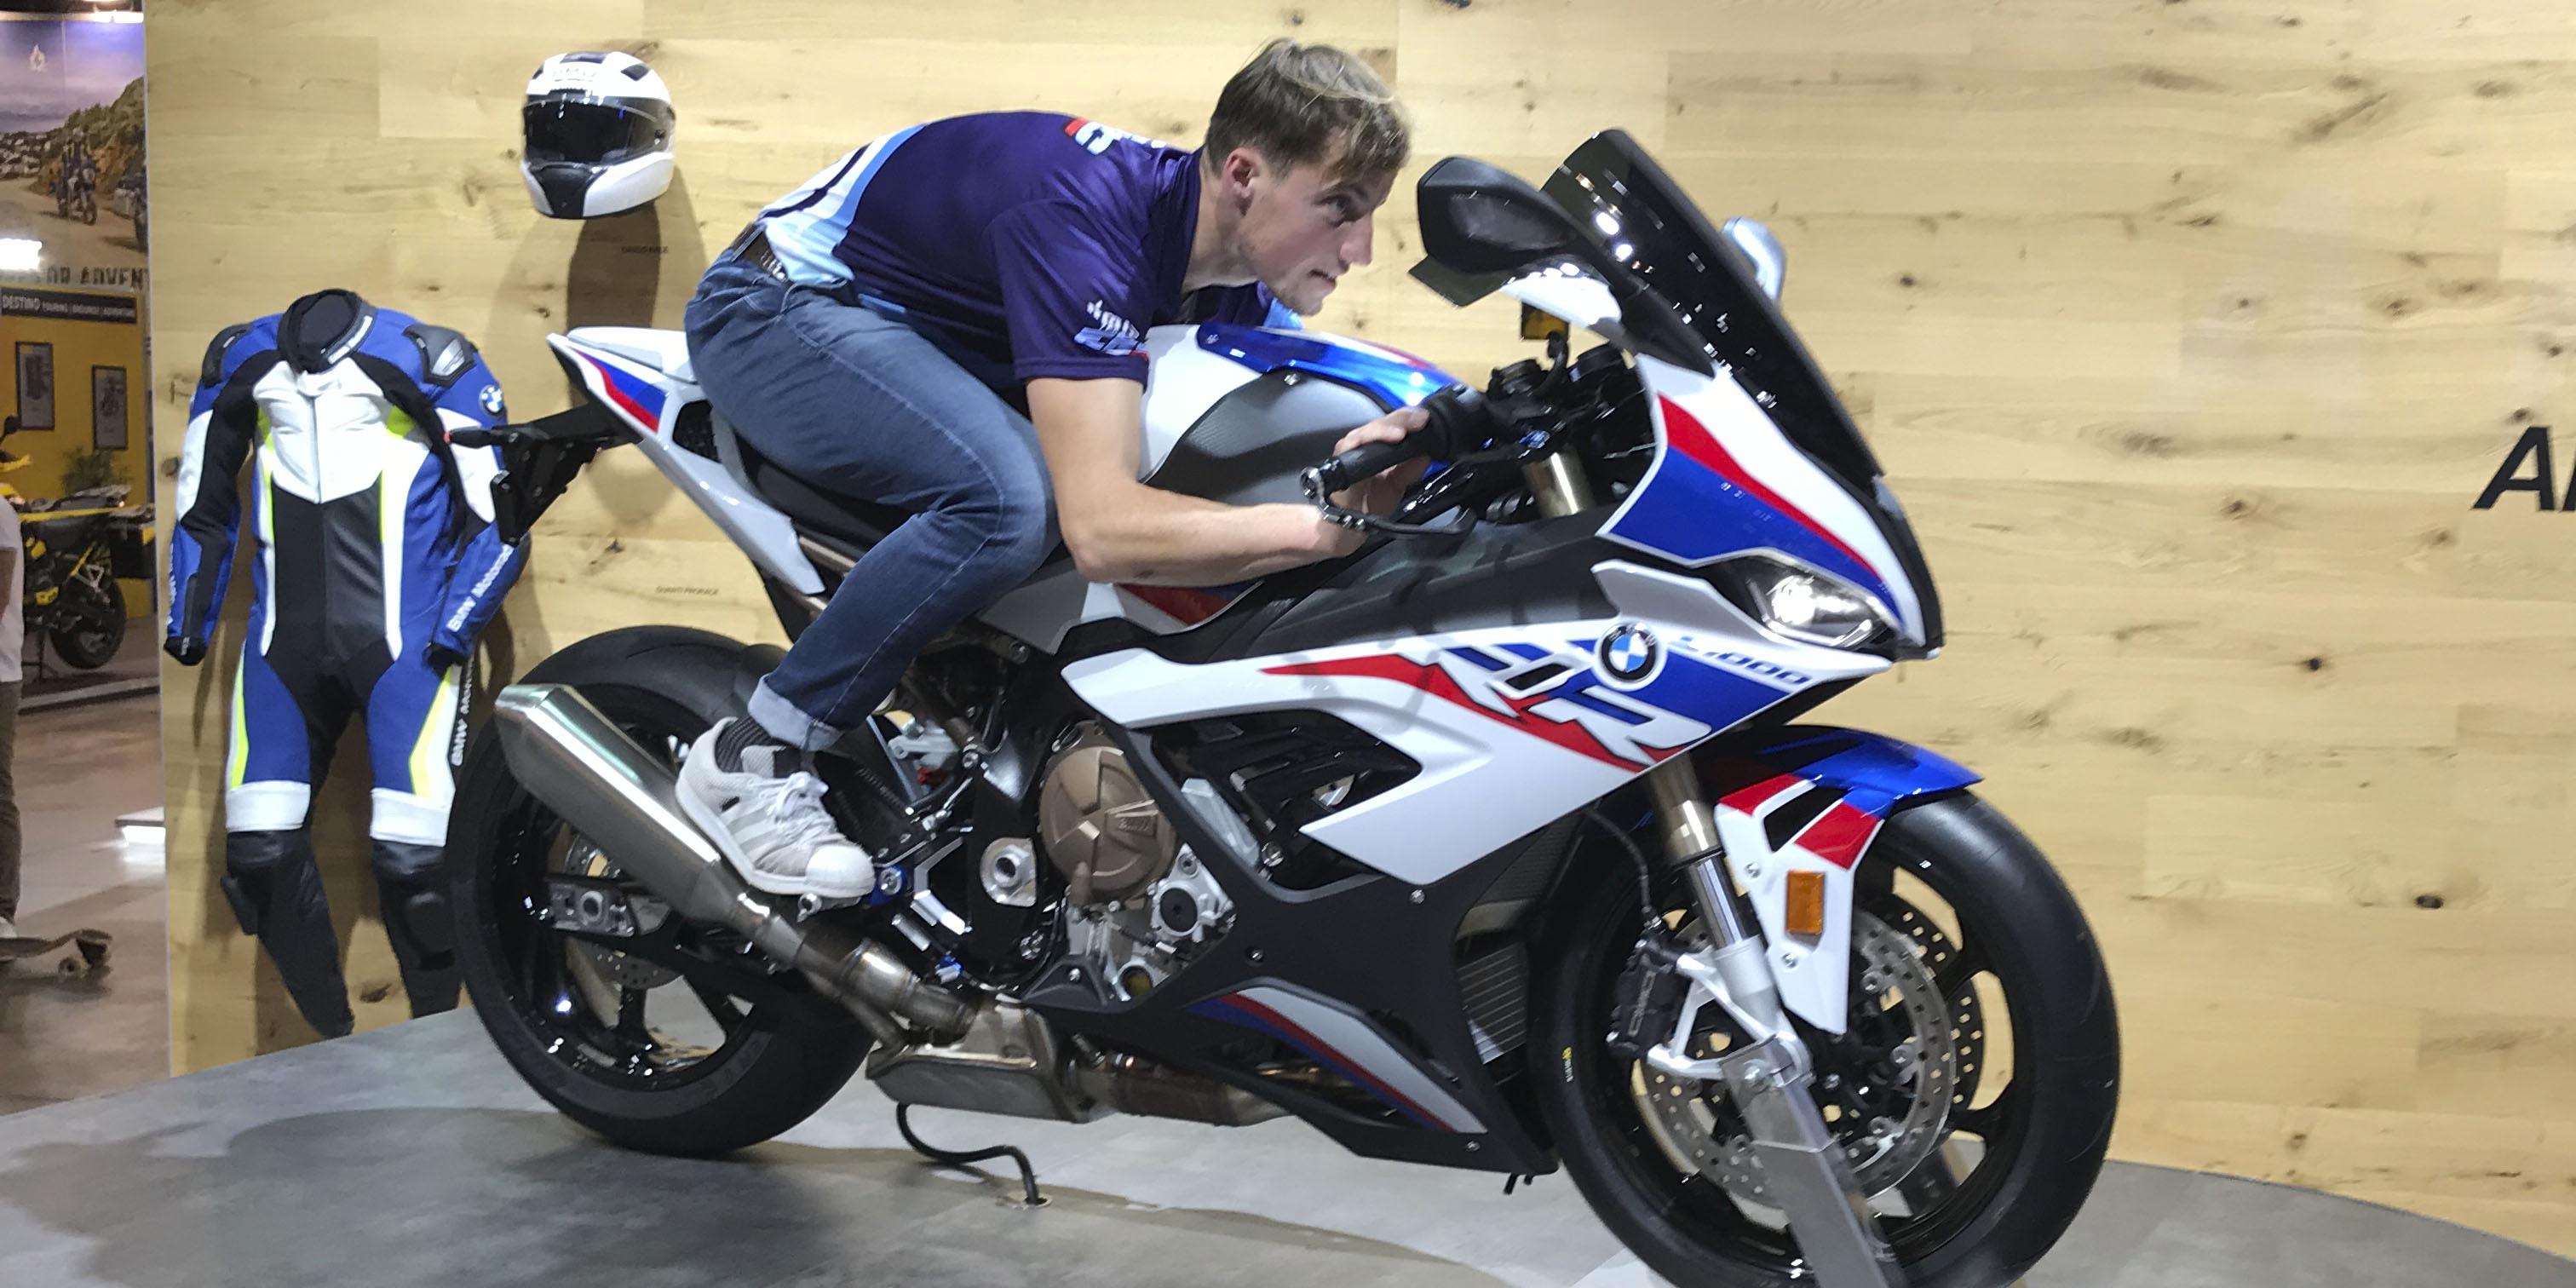 ERC-BMW Motorrad Endurance to wield new weapon in 2019